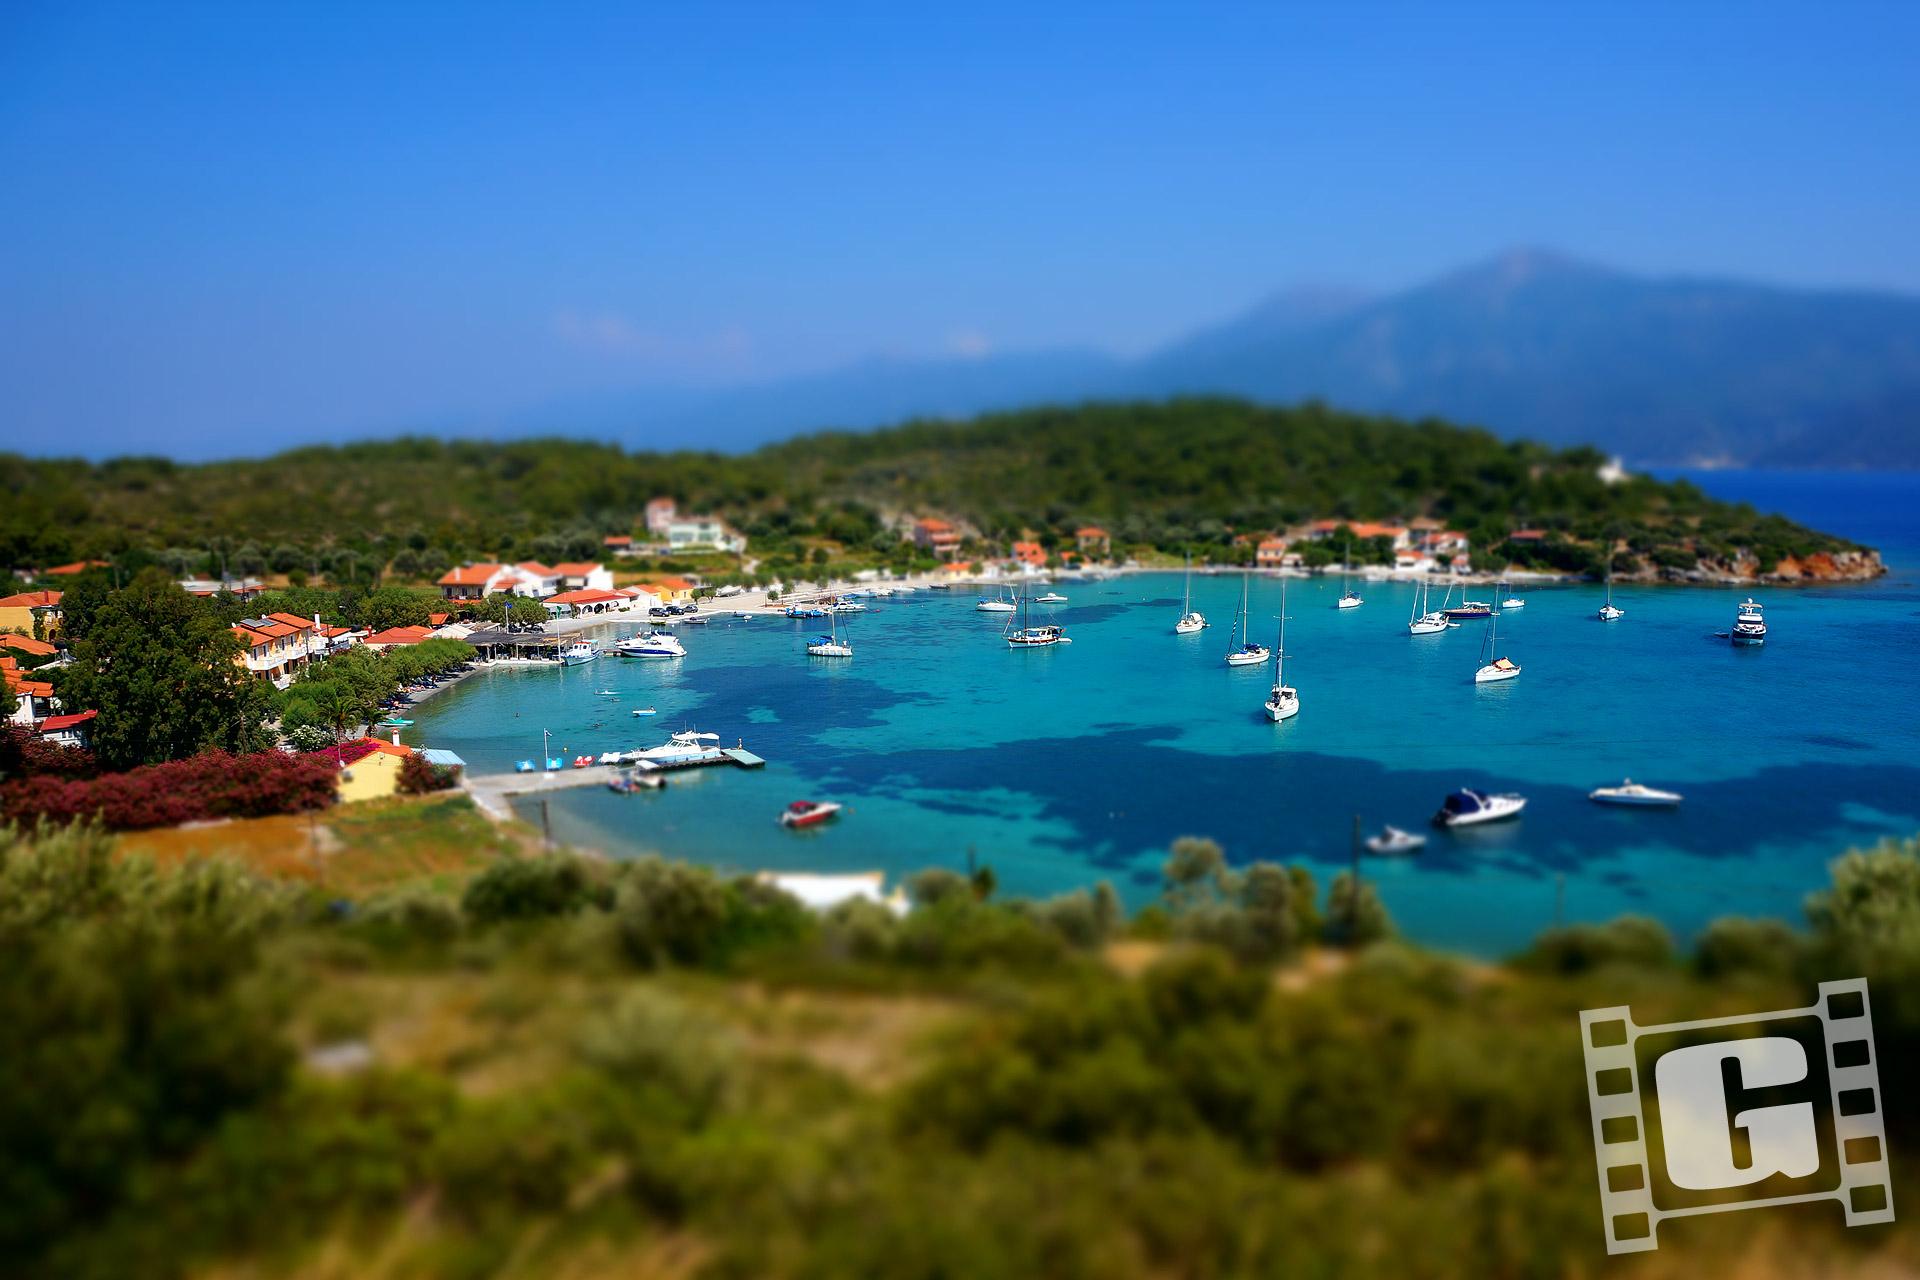 samos island, Greece, ενοικιαζόμενα, αεροφωτογραφία, Γιατράκος, drone, βιντεο, Video, φωτογραφιες